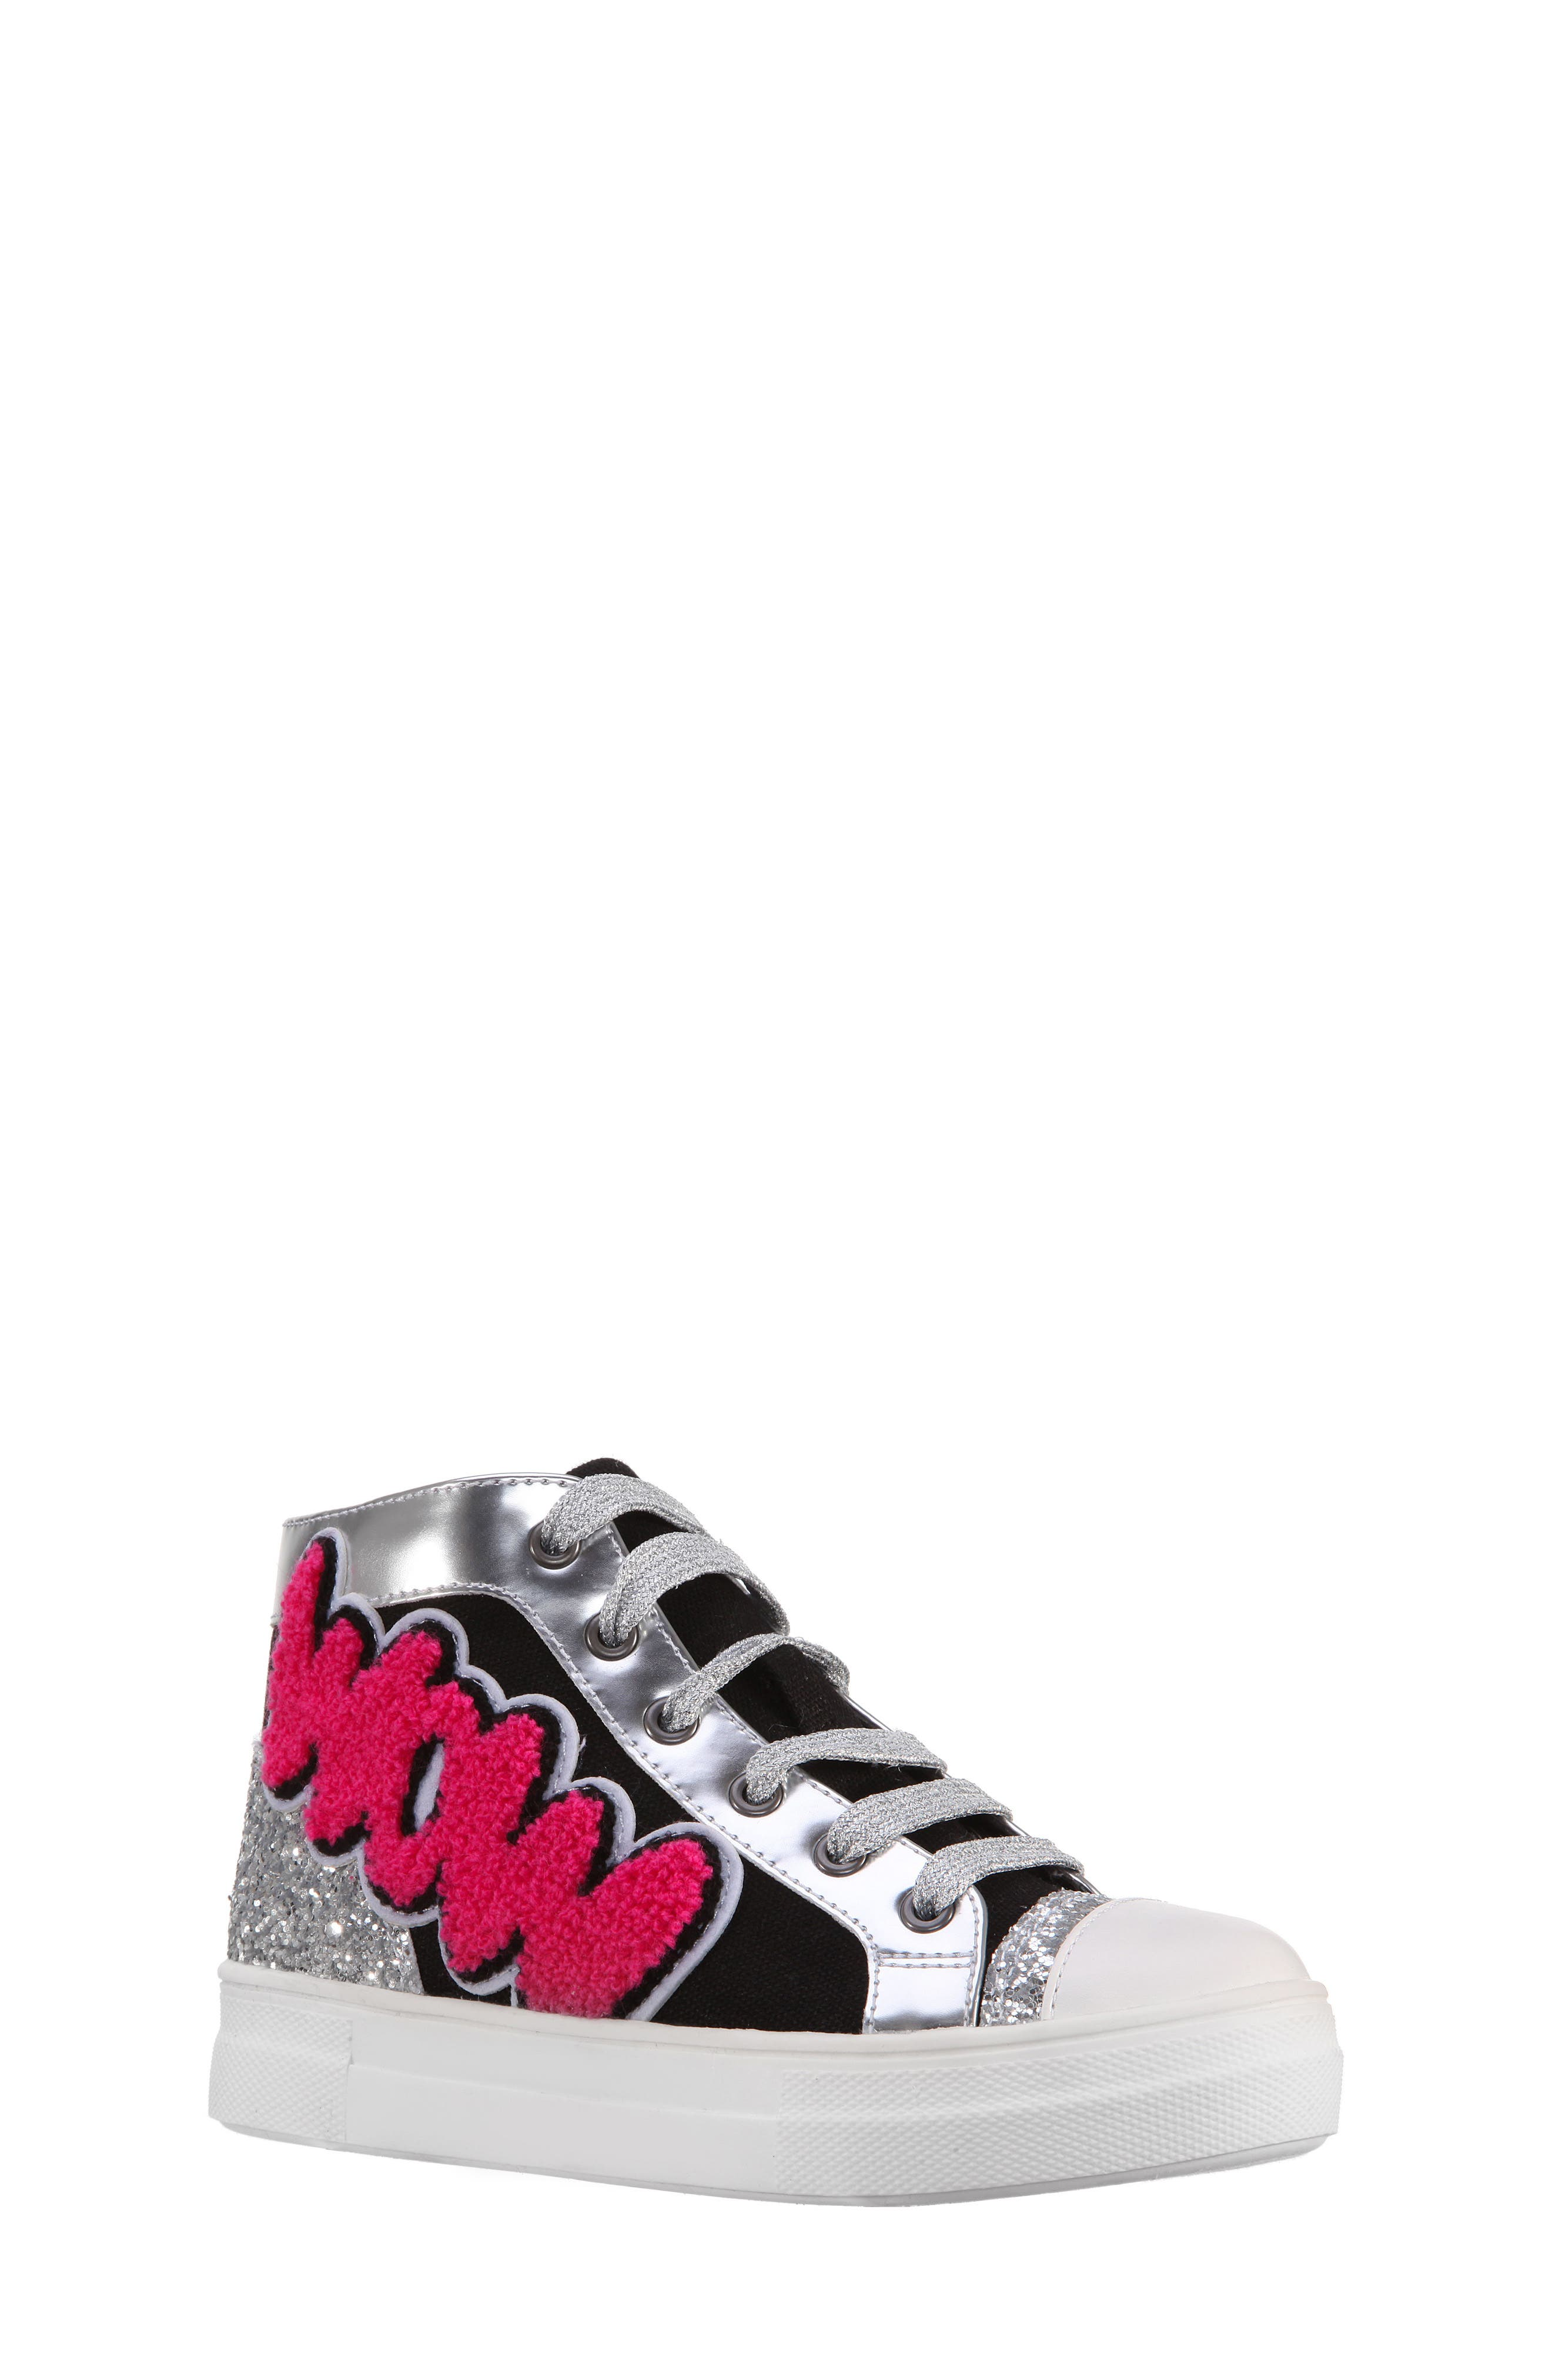 Alternate Image 1 Selected - Nina Gita High Top Sneaker (Toddler, Little Kid & Big Kid)